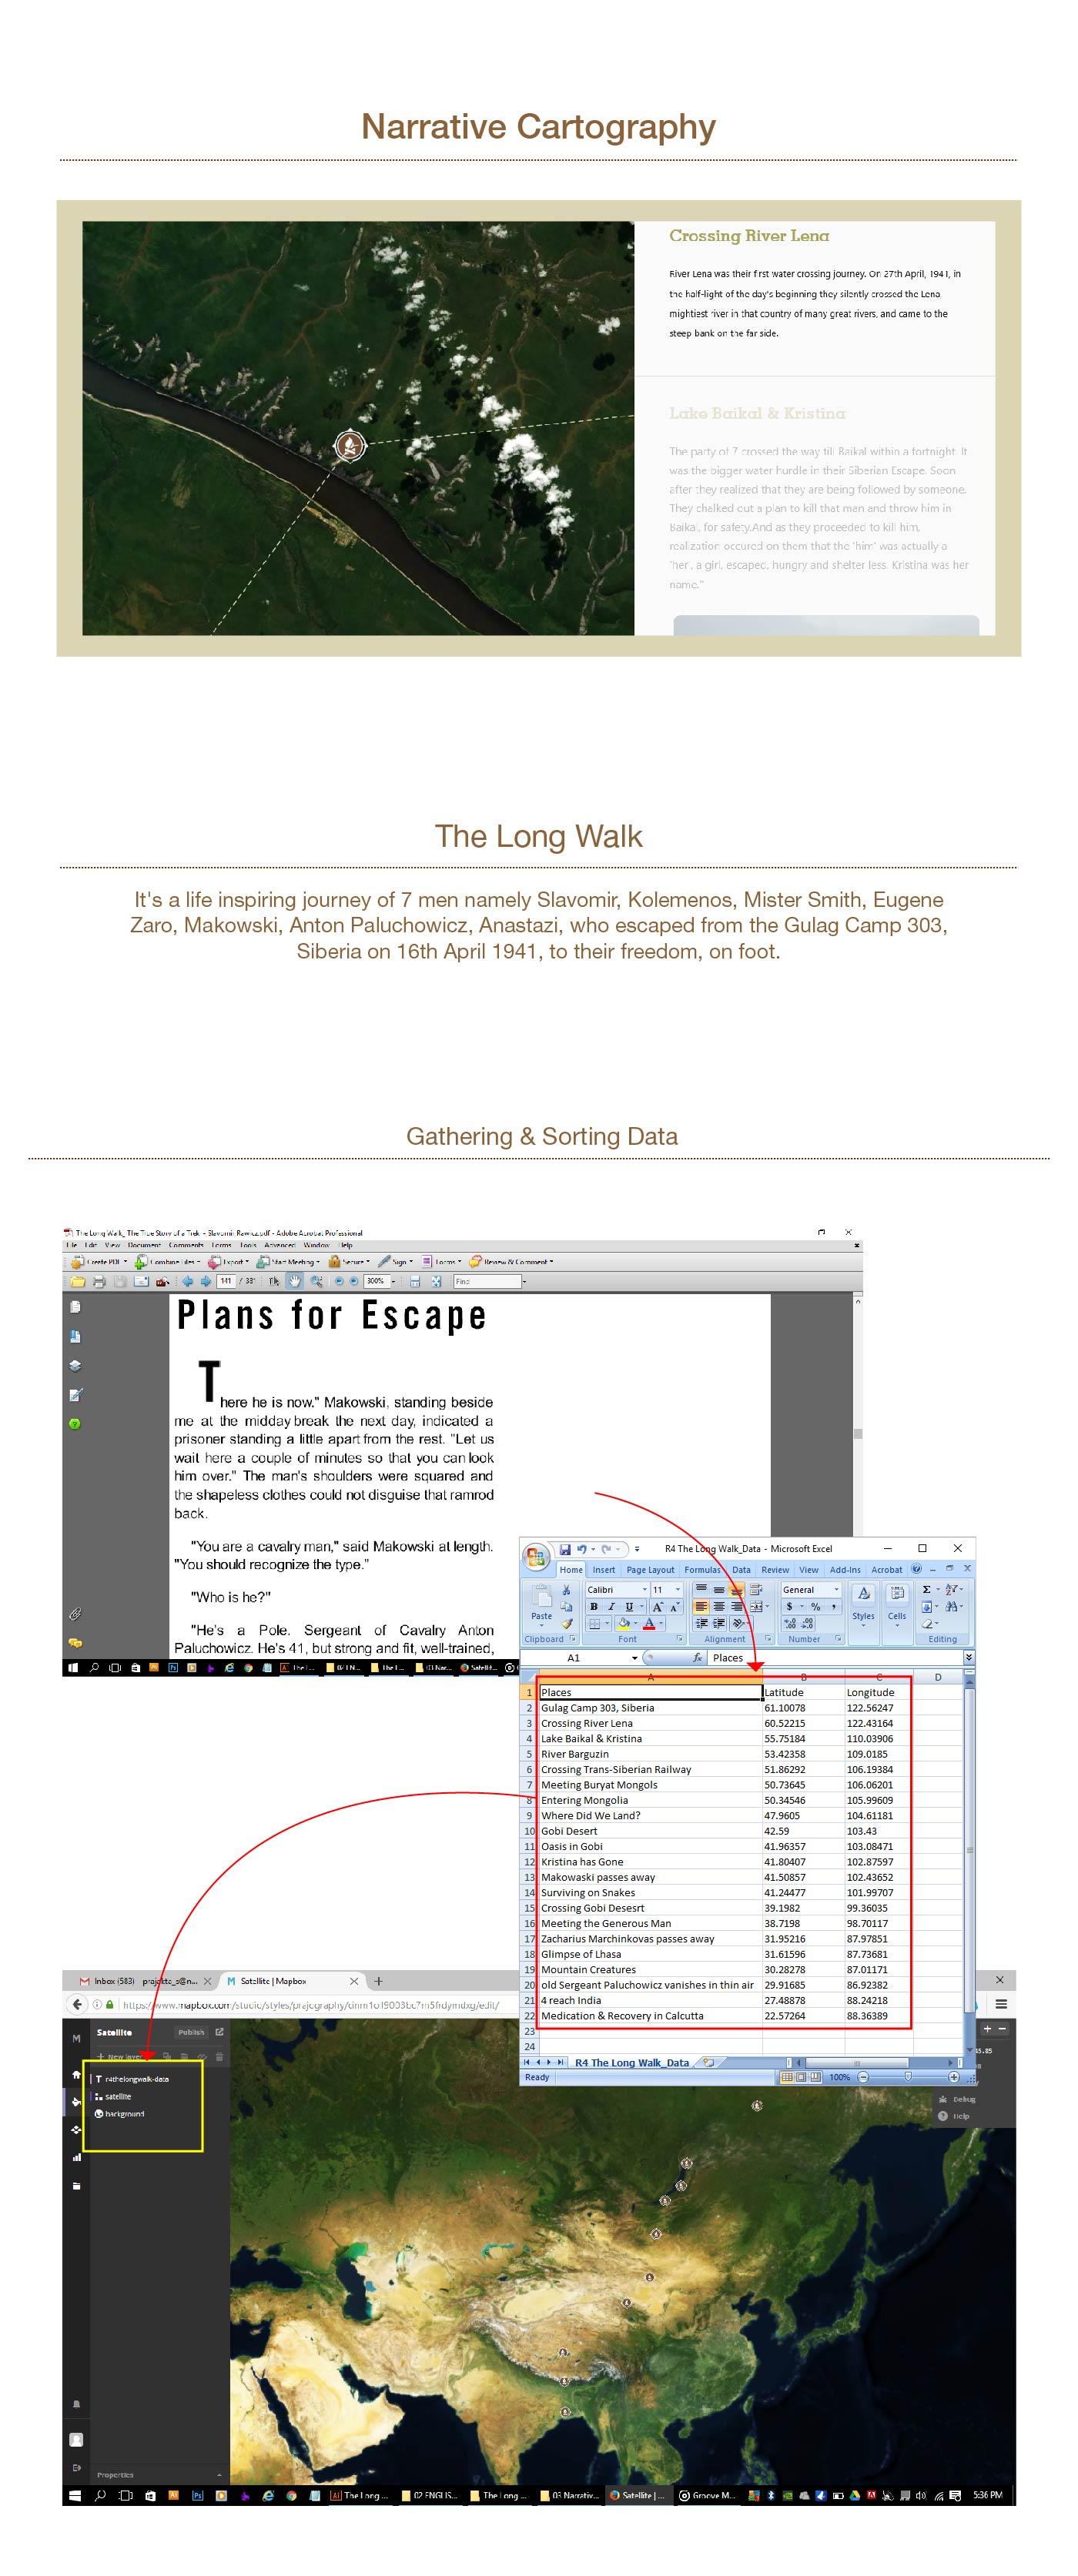 The Long Walk_Narrative Cartography_Doc-01